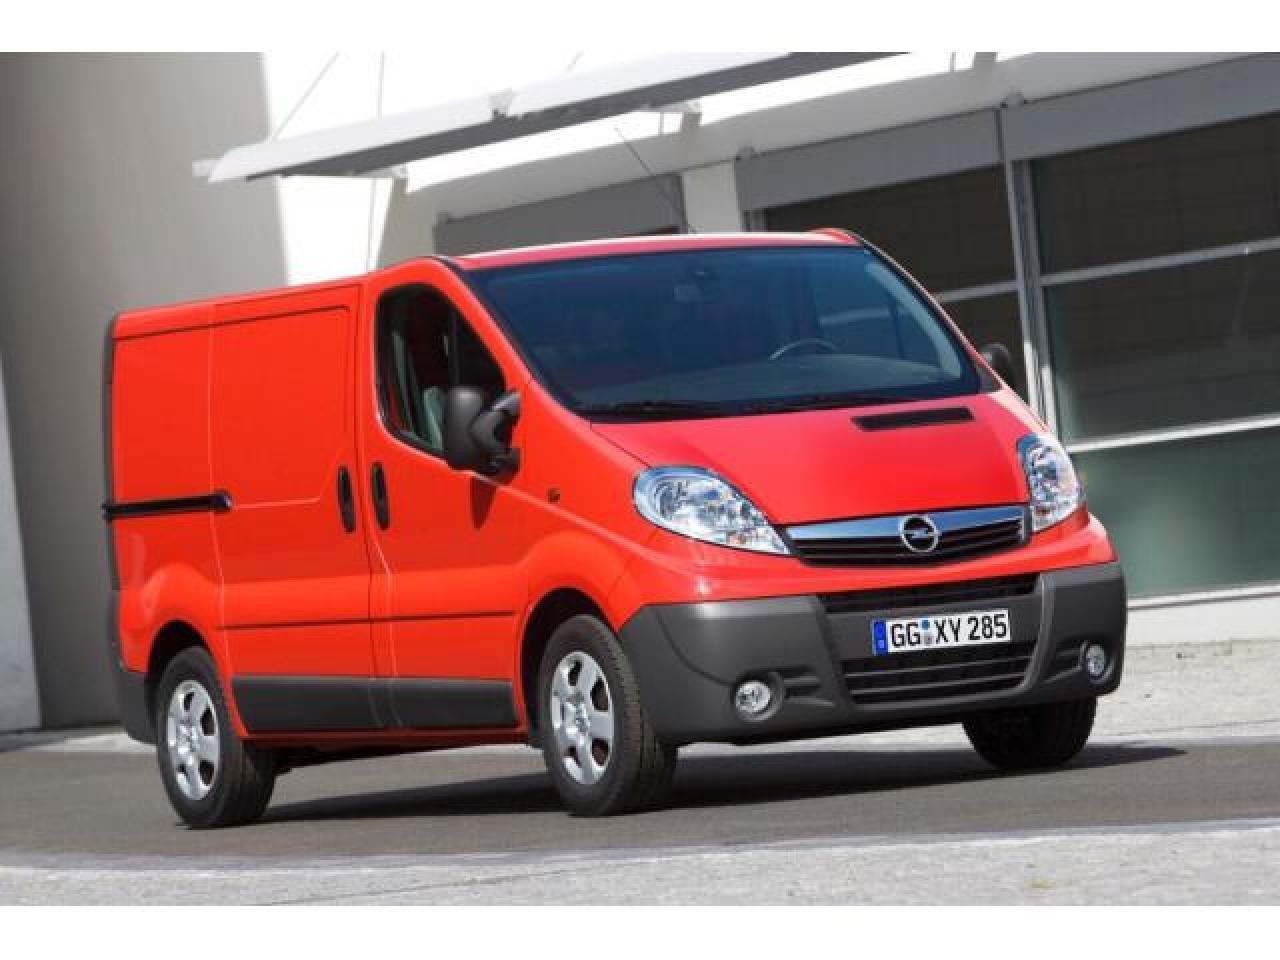 Перевозки грузов, Курьерские услуги, Переезды,Ikea,B&Q - 1